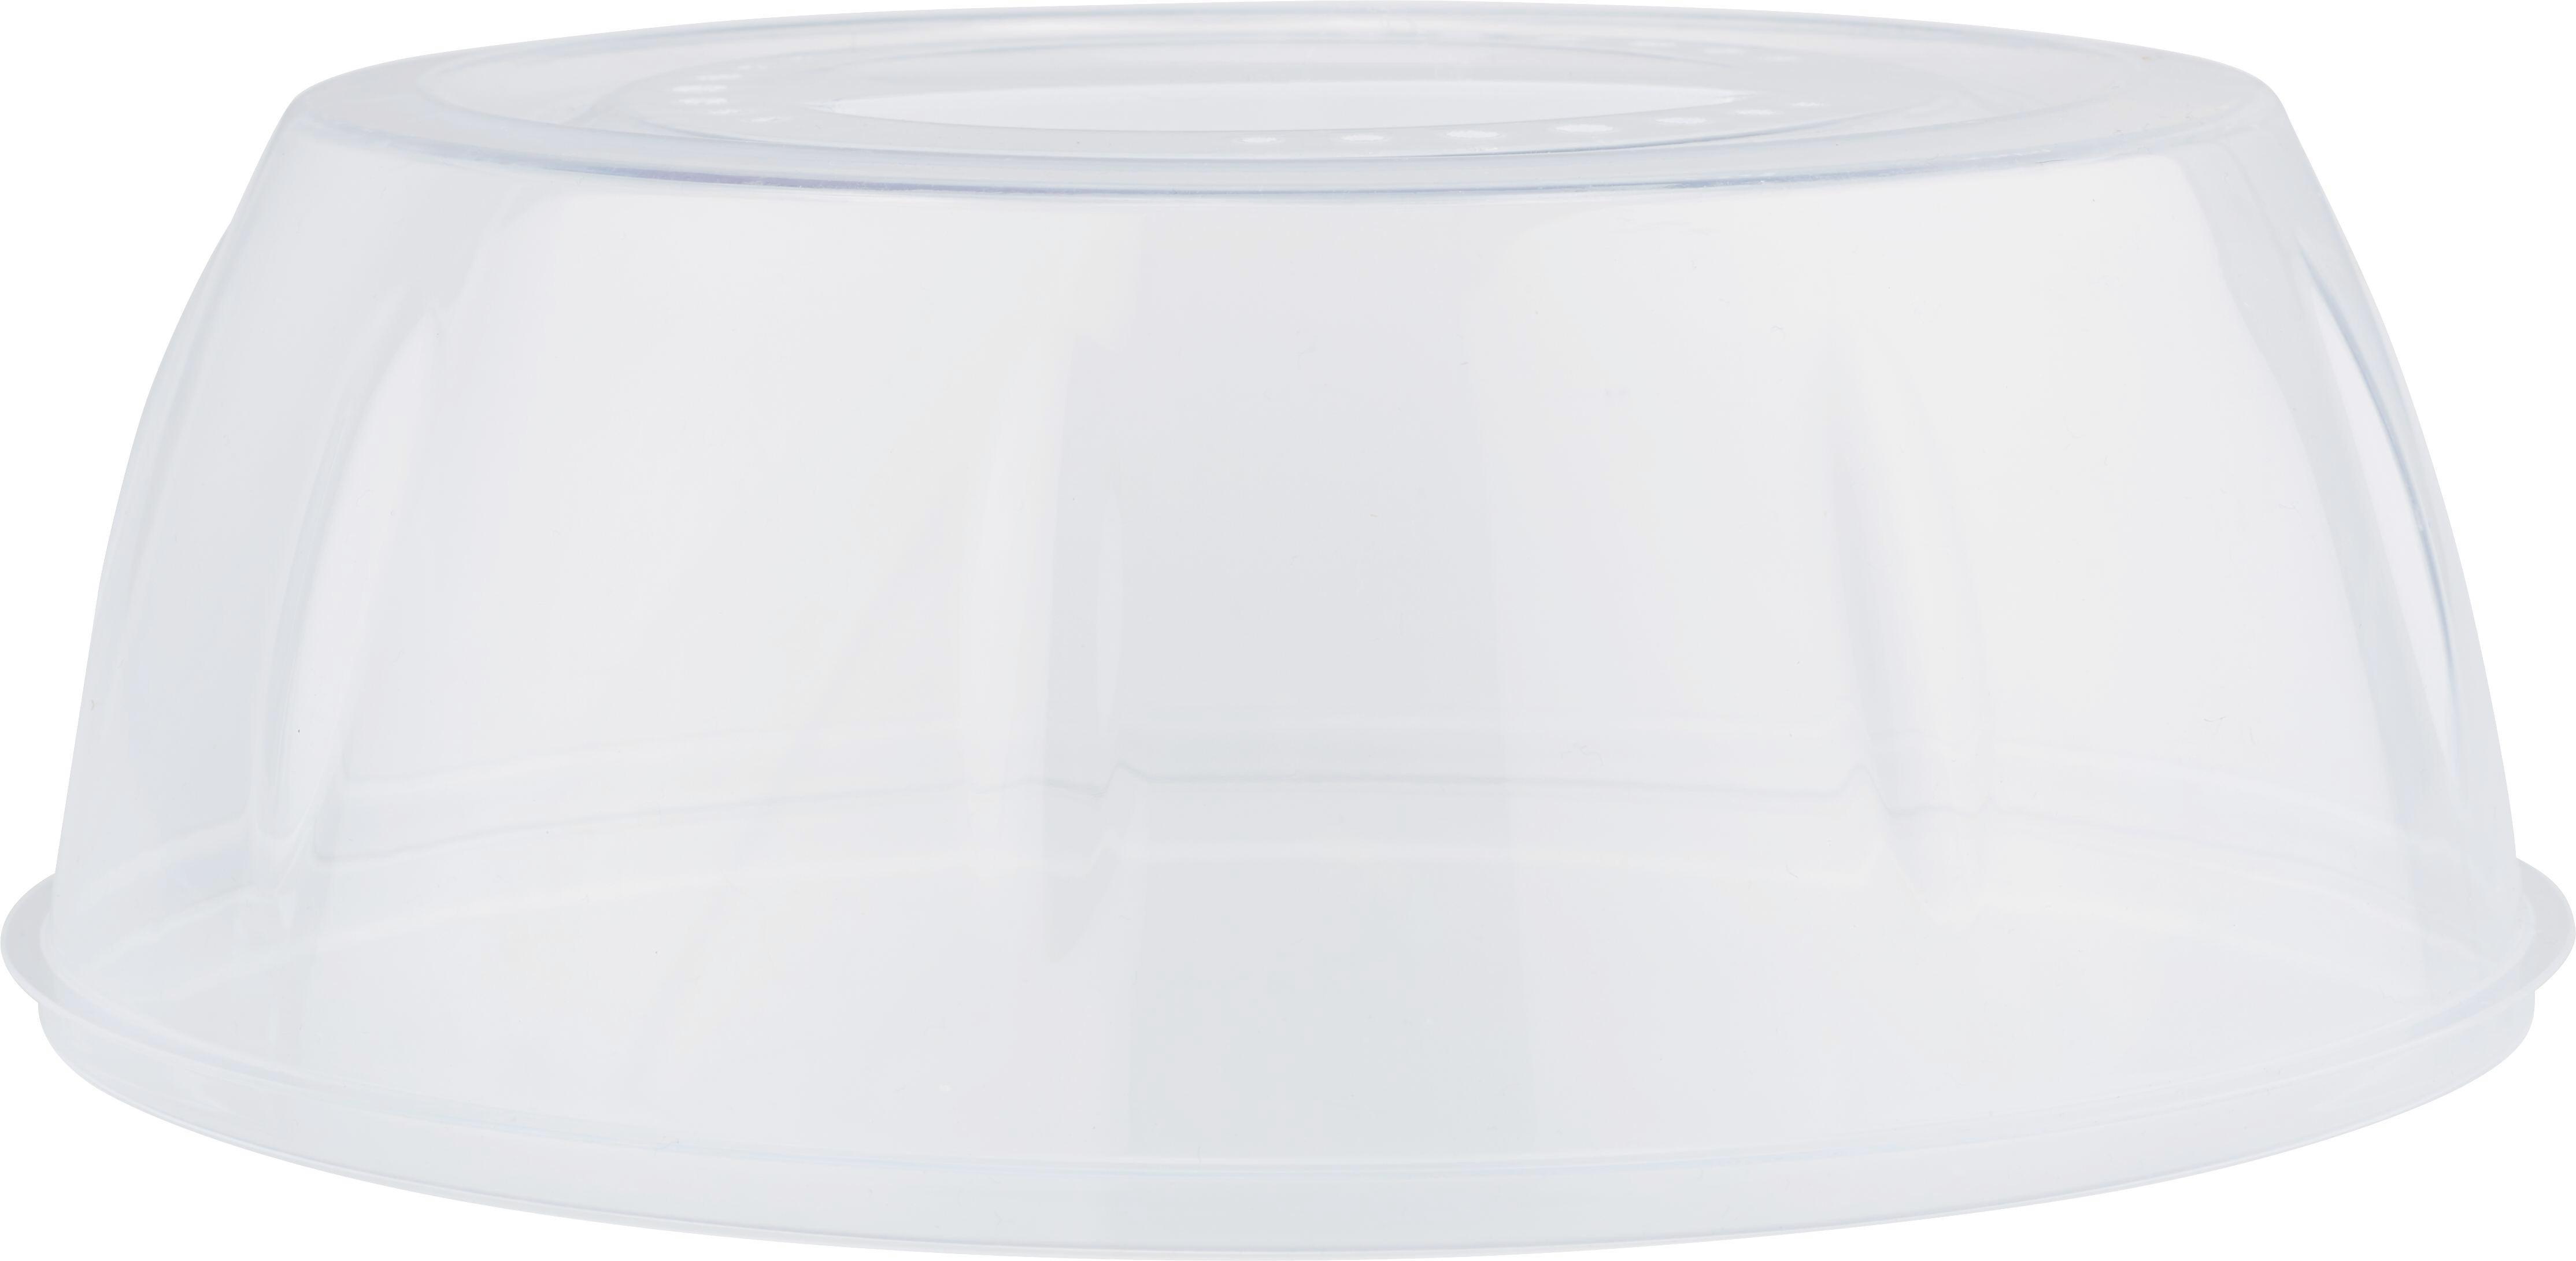 Mikrowellendeckel Leopold aus Kunststoff - Klar, Kunststoff (27/10cm) - MÖMAX modern living